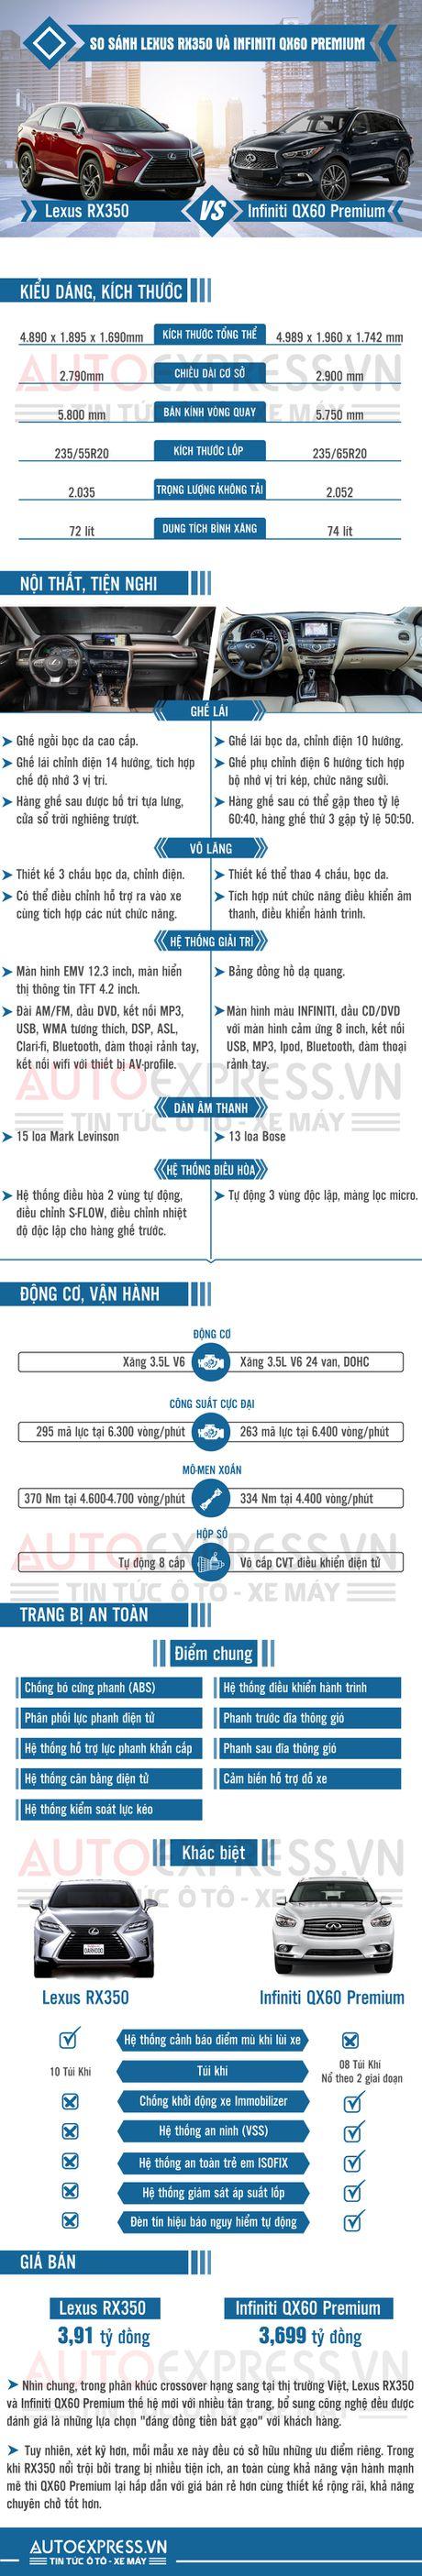 Chon Lexus RX350 hay Infiniti QX60 khi mua Crossover hang sang? - Anh 1